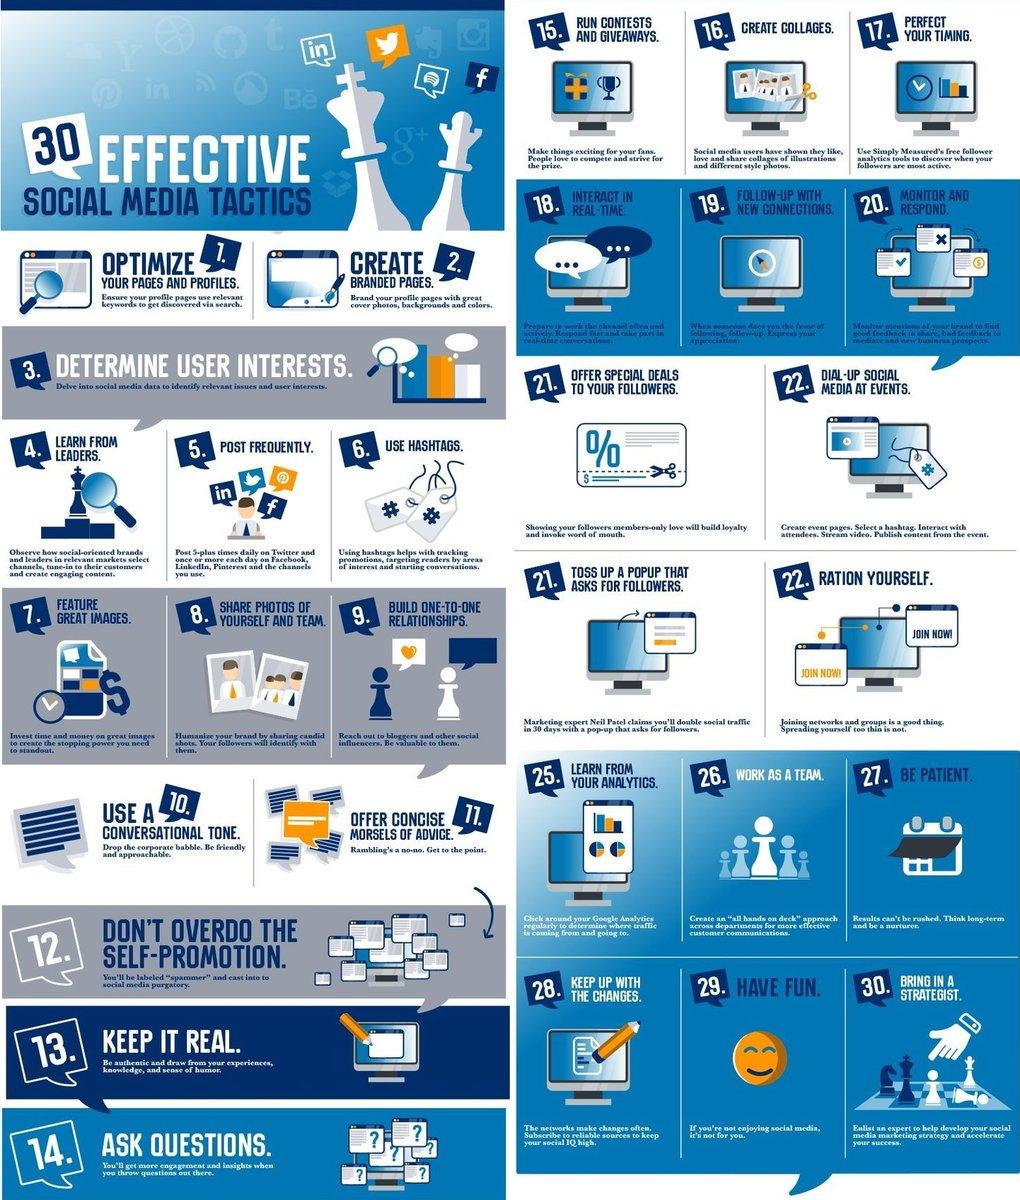 #Socialmedia tactics #DigitalMarketing #Internetmarketing #SMM #Mpgvip #defstar5 #makeyourownlane #Growthhacking #RT #al #IoT #CX #Startups<br>http://pic.twitter.com/uCQLayho2p